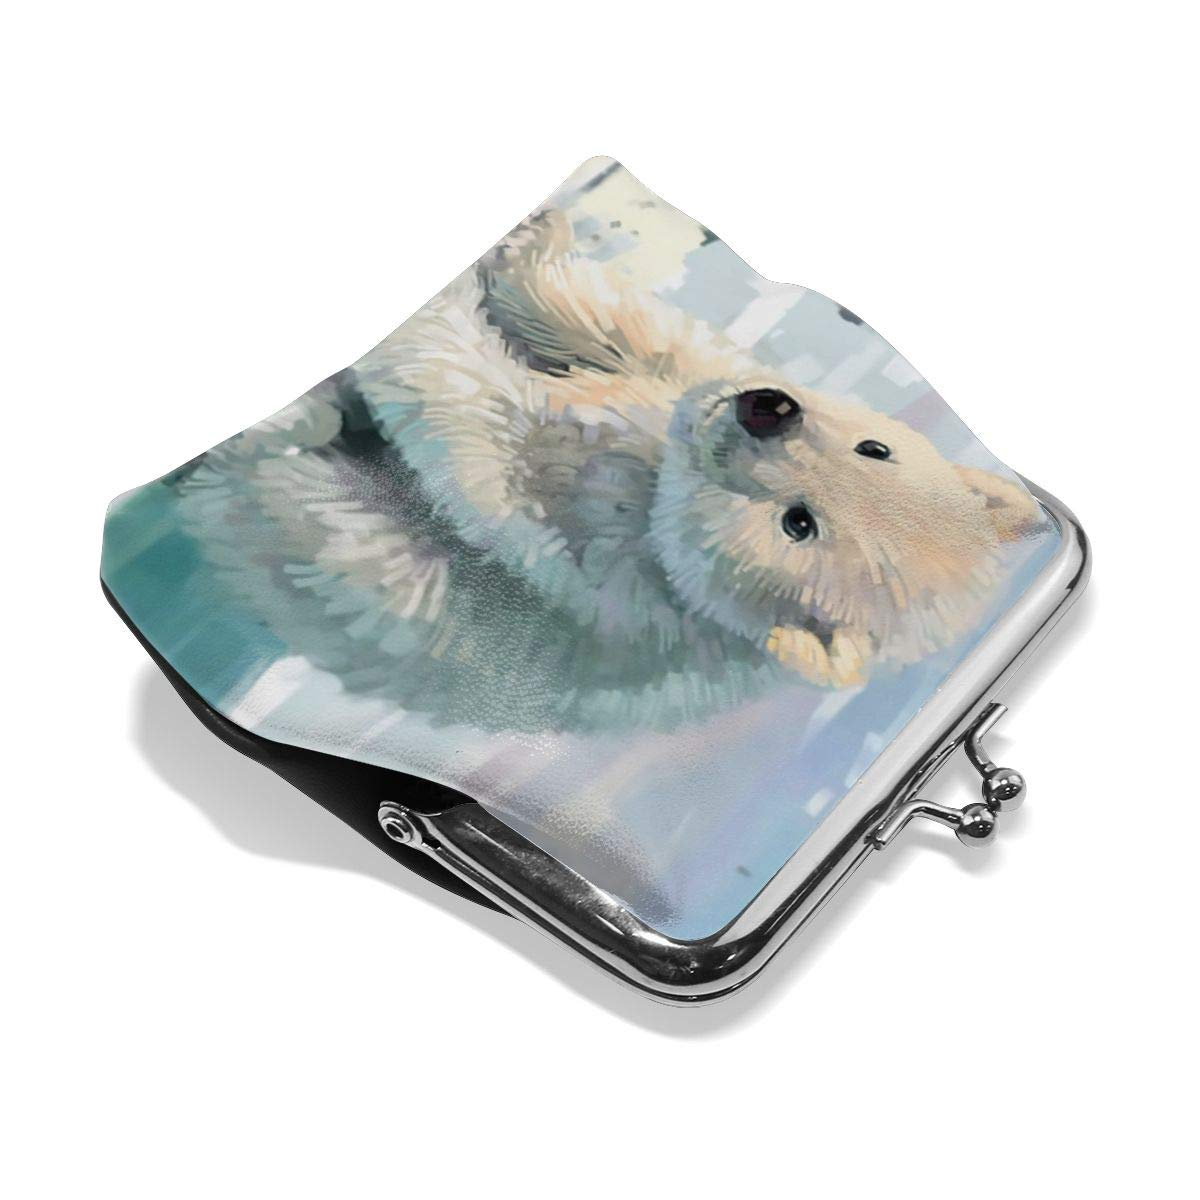 Exquisite Cute Animal Polar Bear Baby Key Buckle Coin Purse For Womens